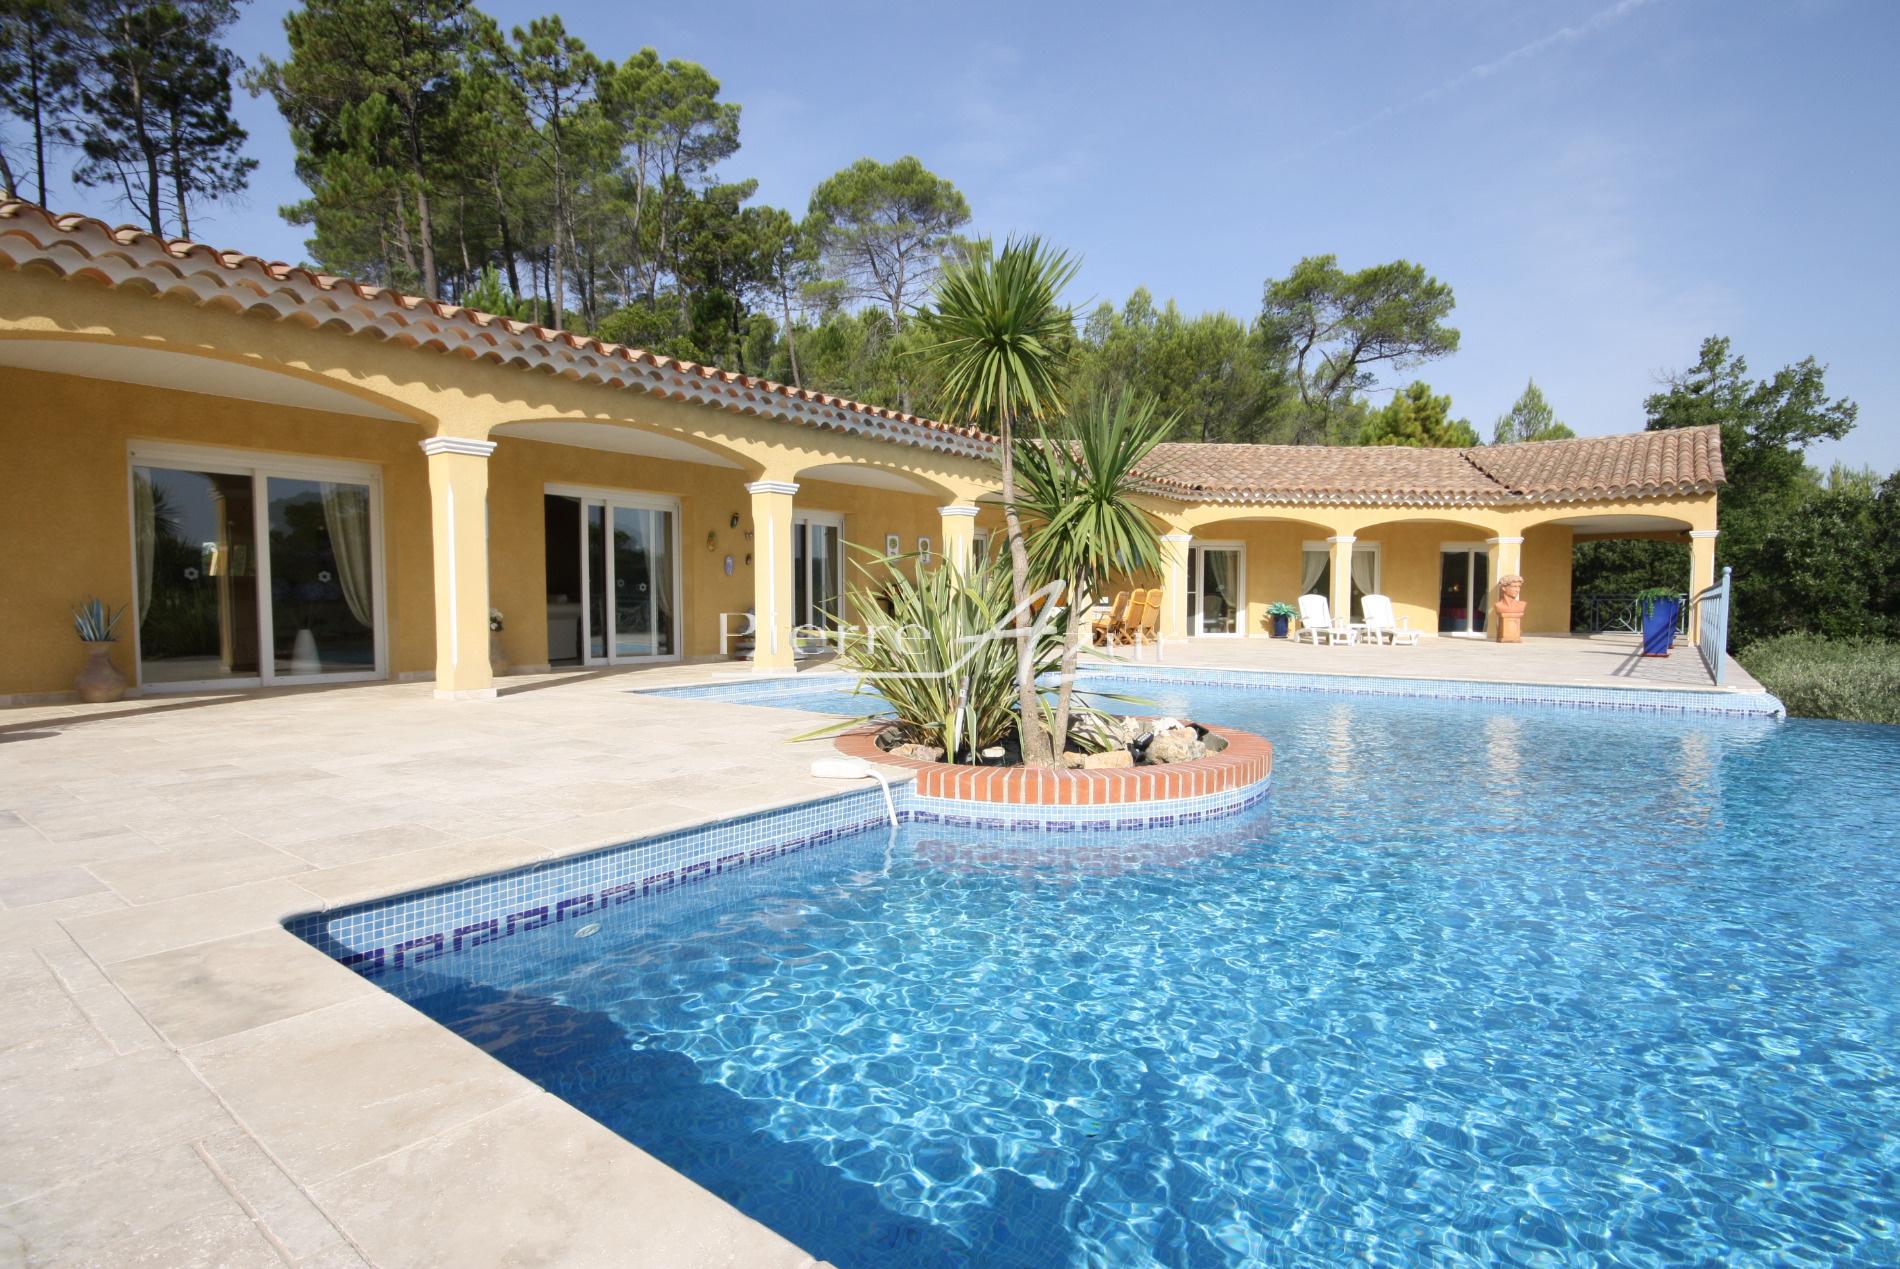 impressionnant diagnostic piscine pour vente piscine. Black Bedroom Furniture Sets. Home Design Ideas